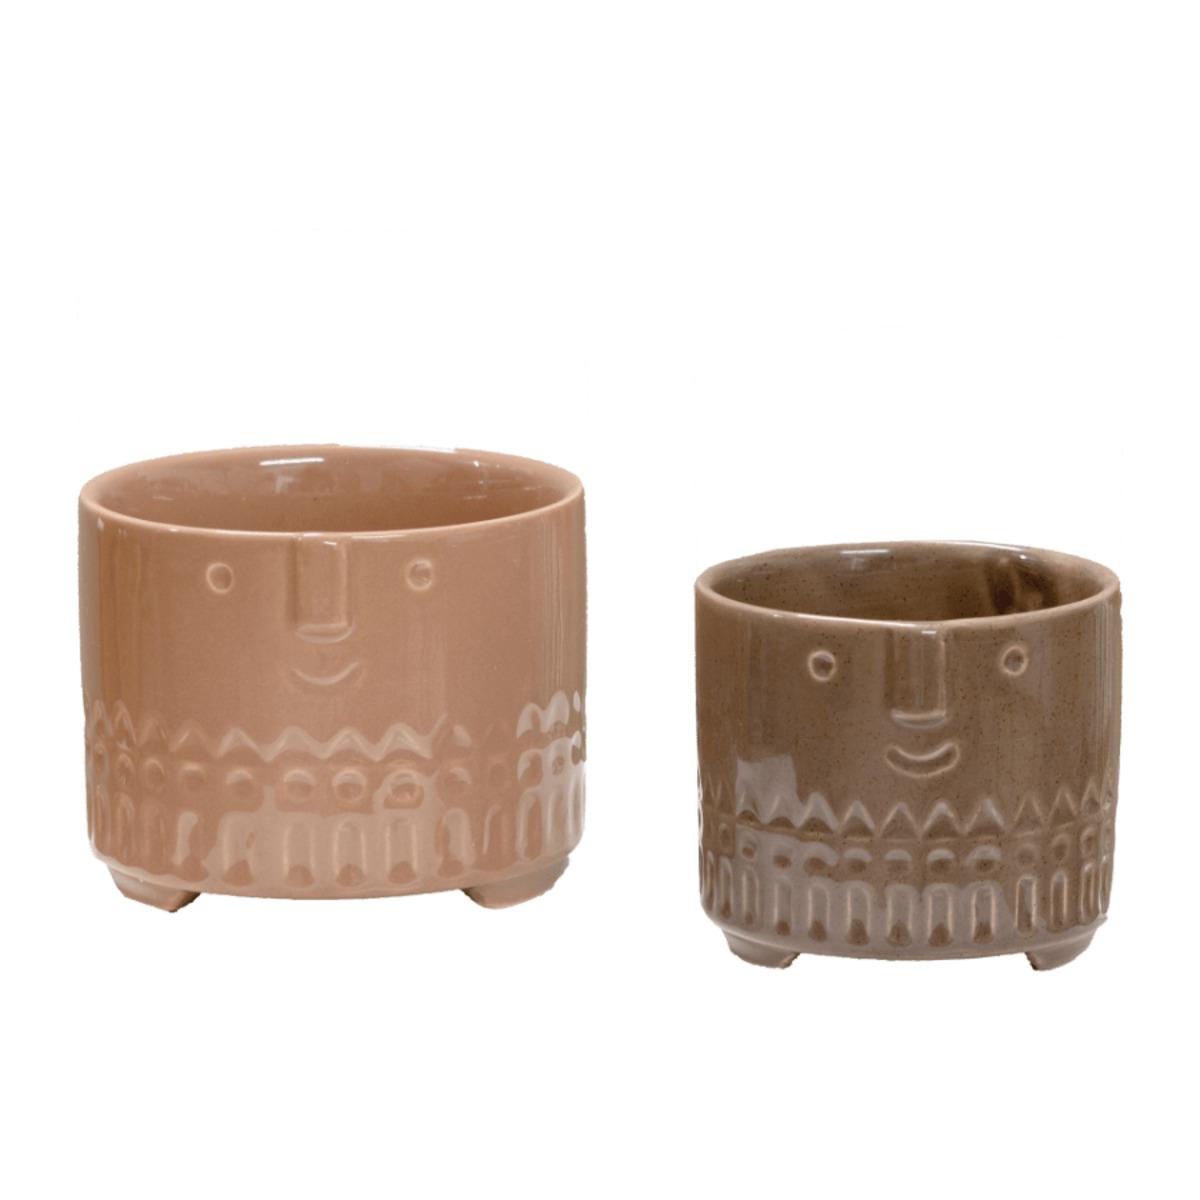 Bild 2 von LIVING ART     Keramik Sortiment